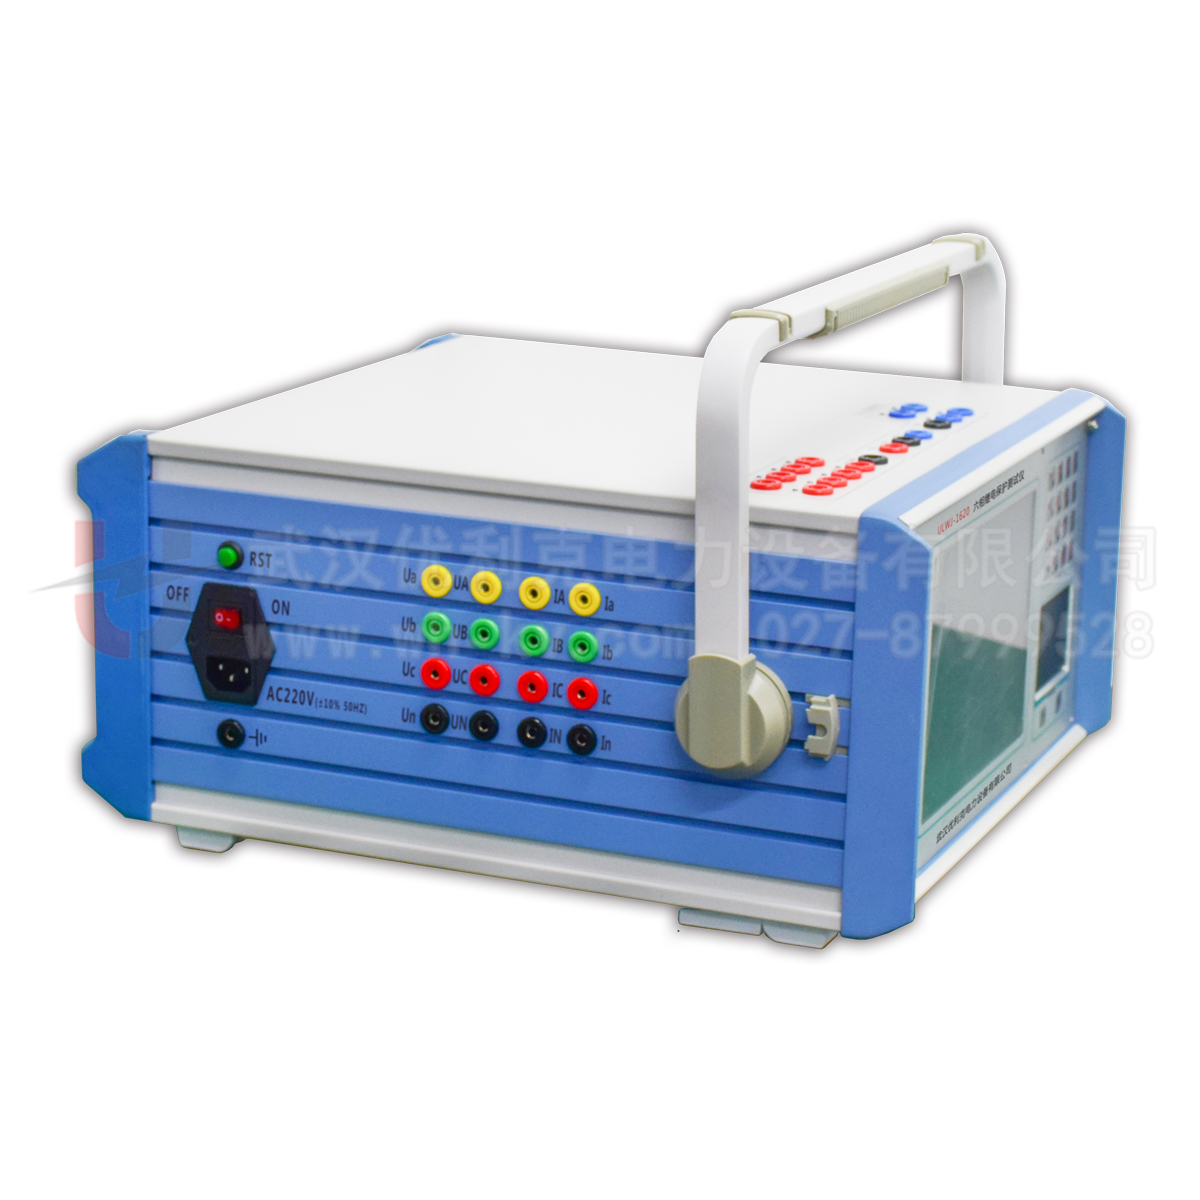 ULWJ-1620六相继电保护测试仪